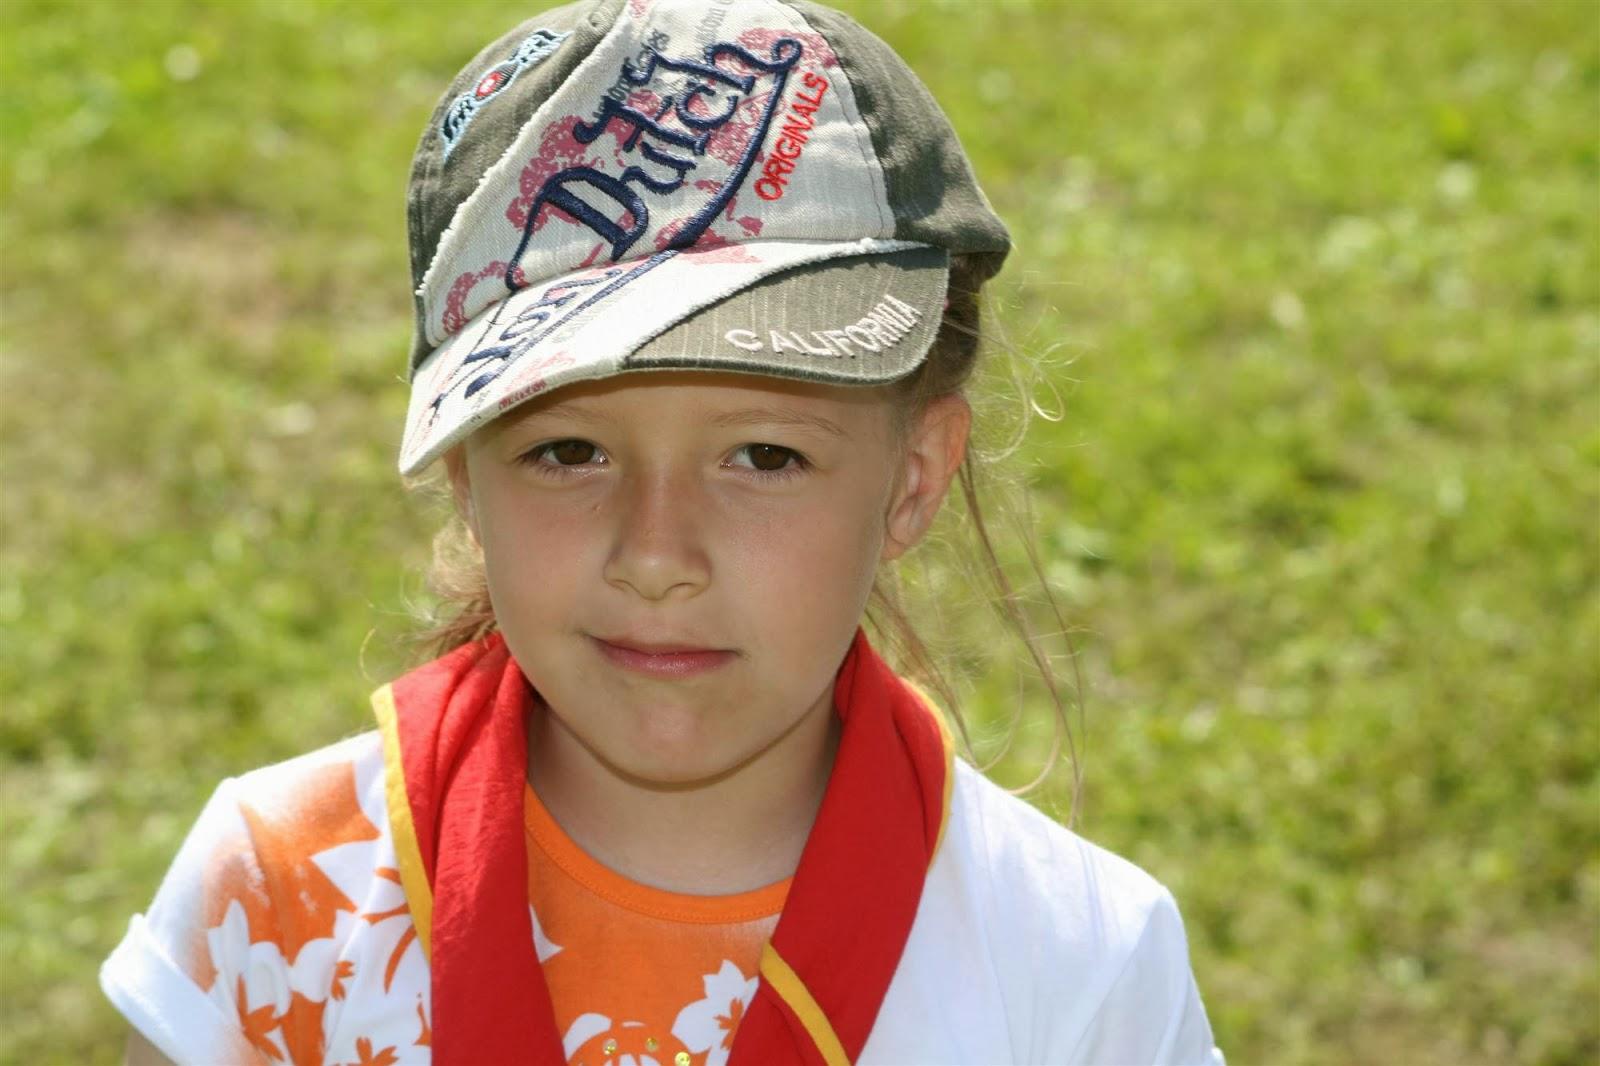 Državni mnogoboj, Velenje 2007 - IMG_8792.jpg